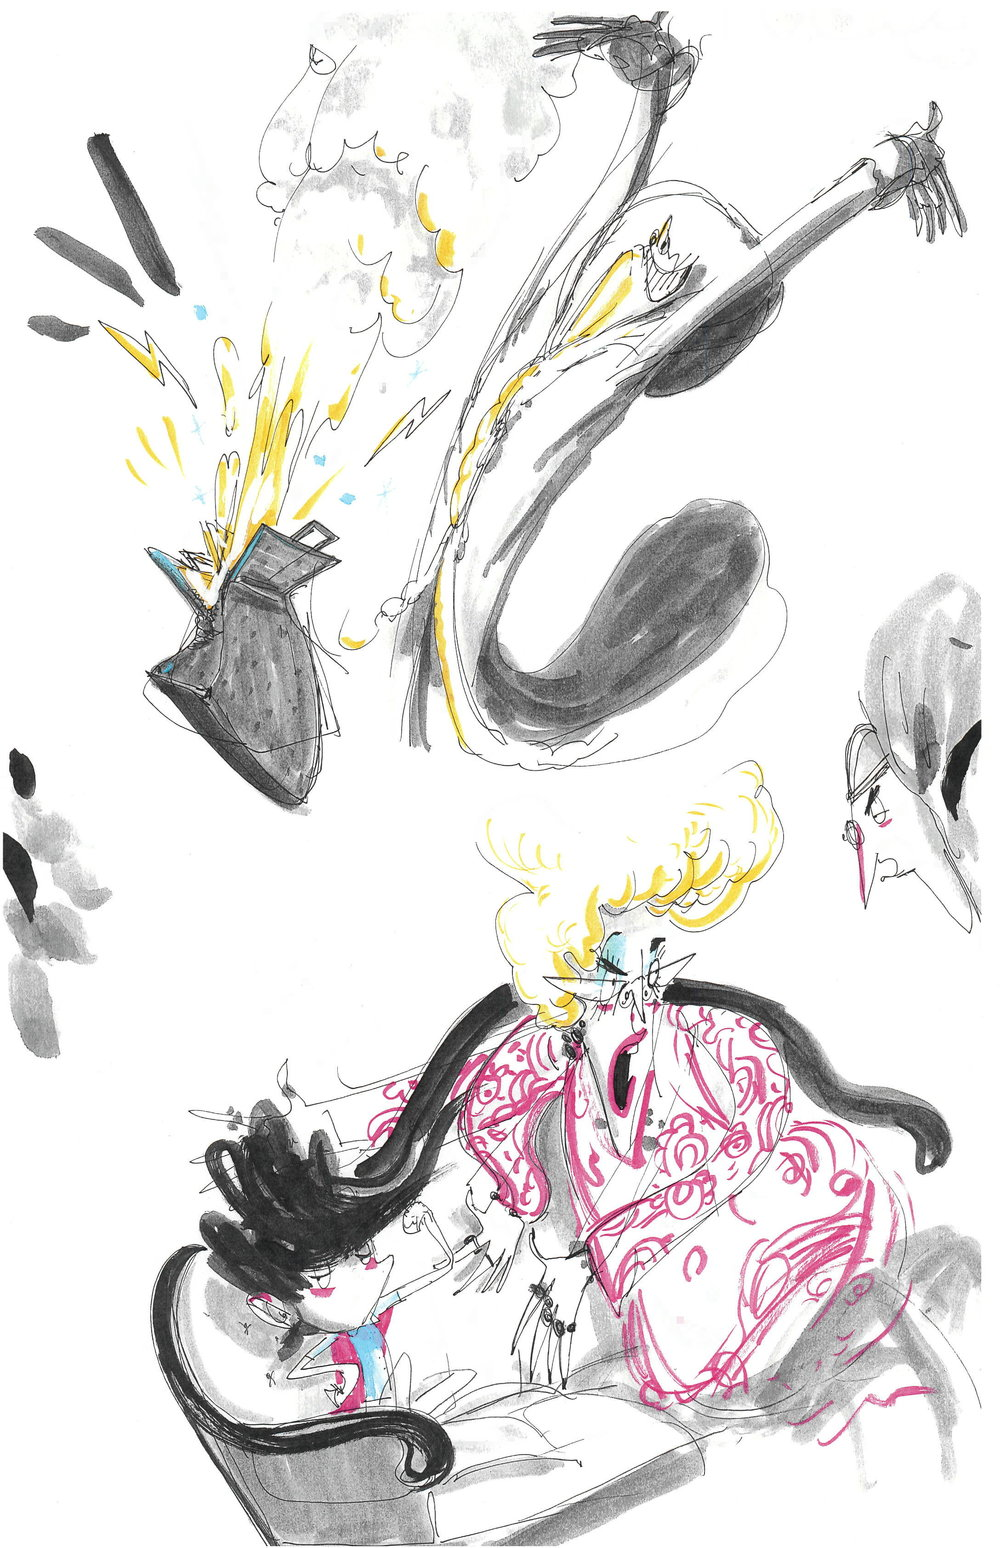 BRIANWONDERS-sketches-1_Page_07_Image_0001.jpg